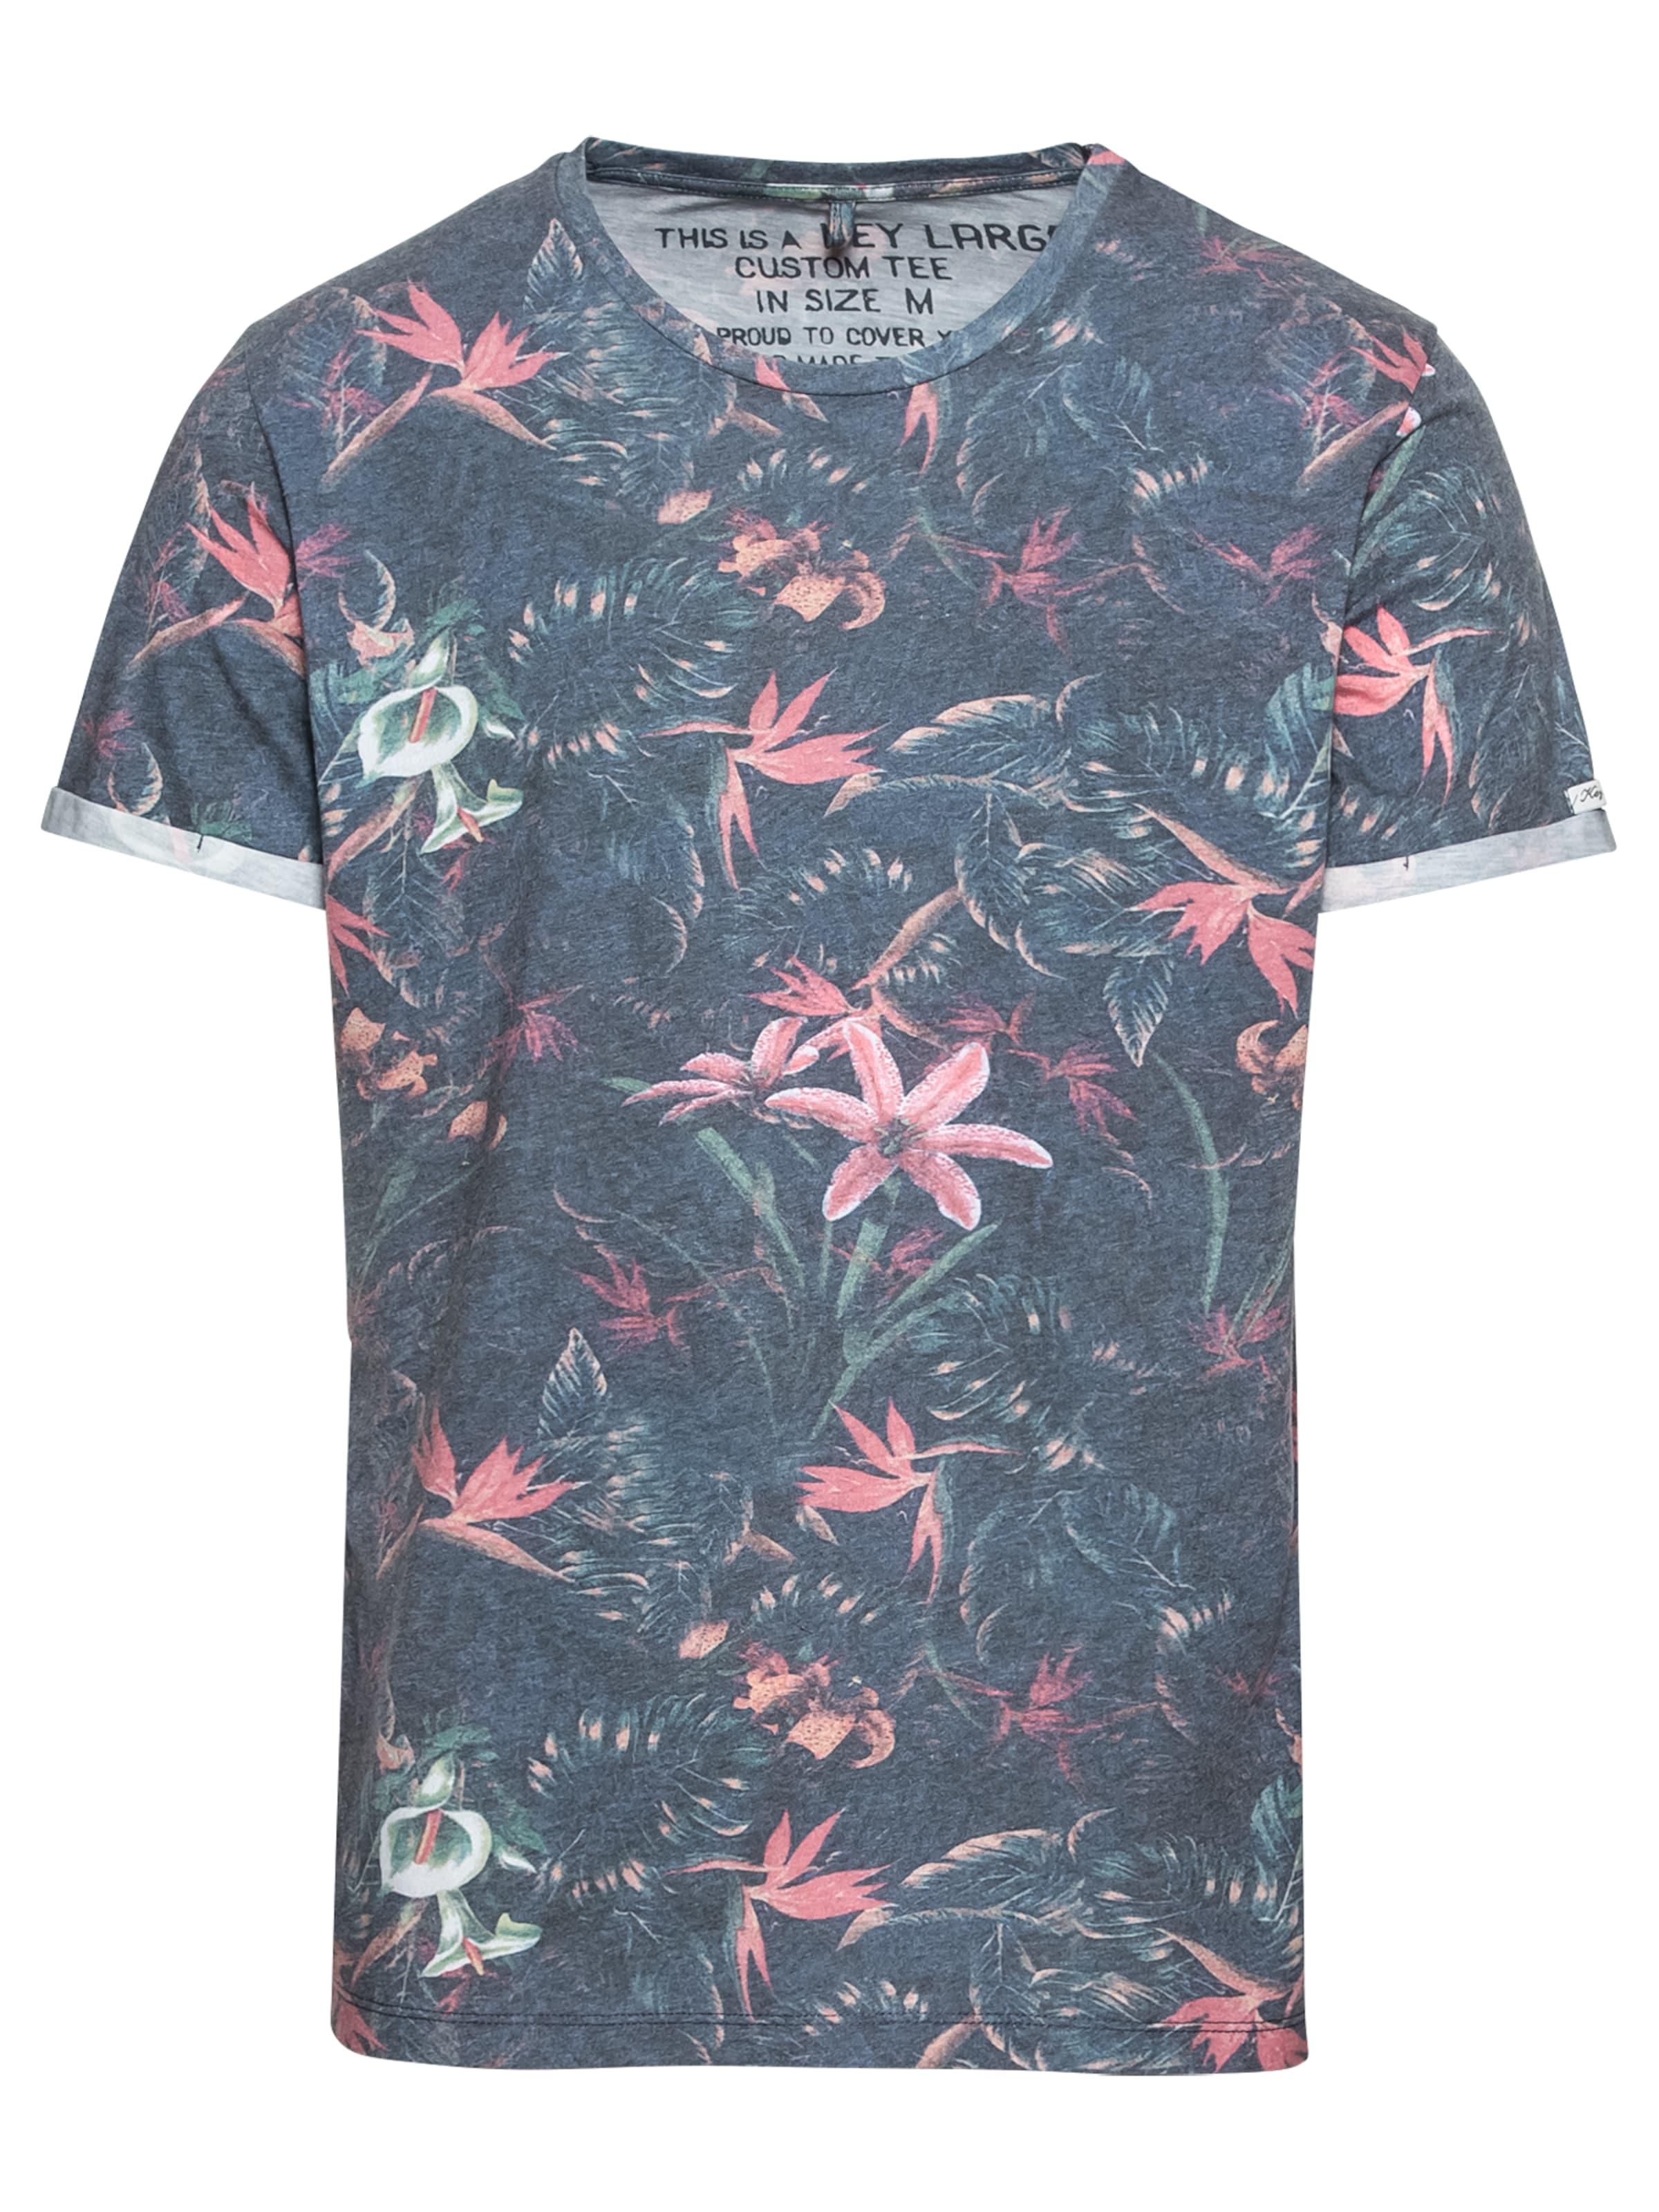 Jungle En Key Round' Largo 'mt shirt Bleu T FuméRose ulcK1T3JF5